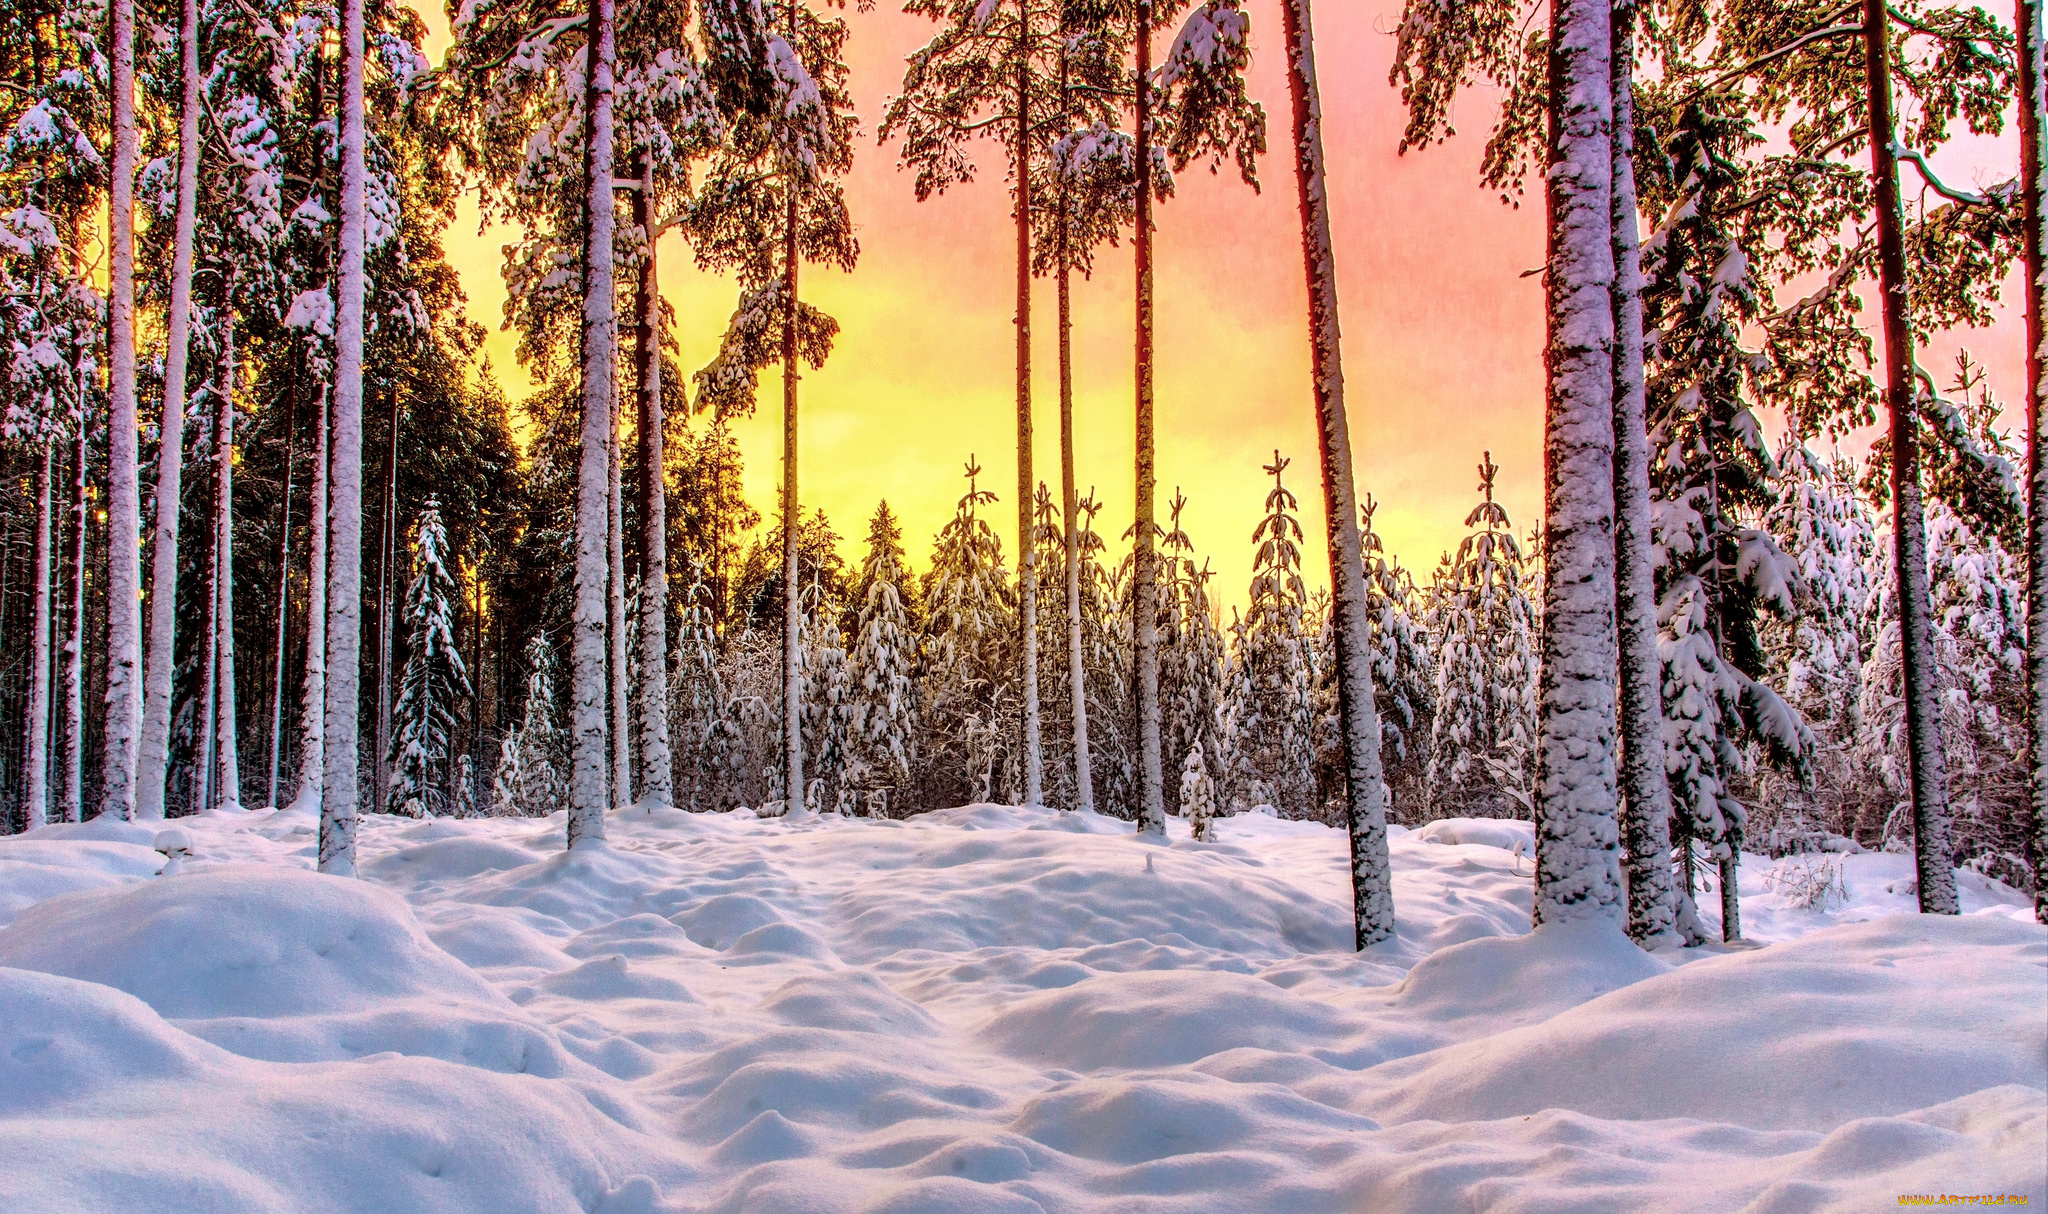 Обои На Стол Зимний Лес